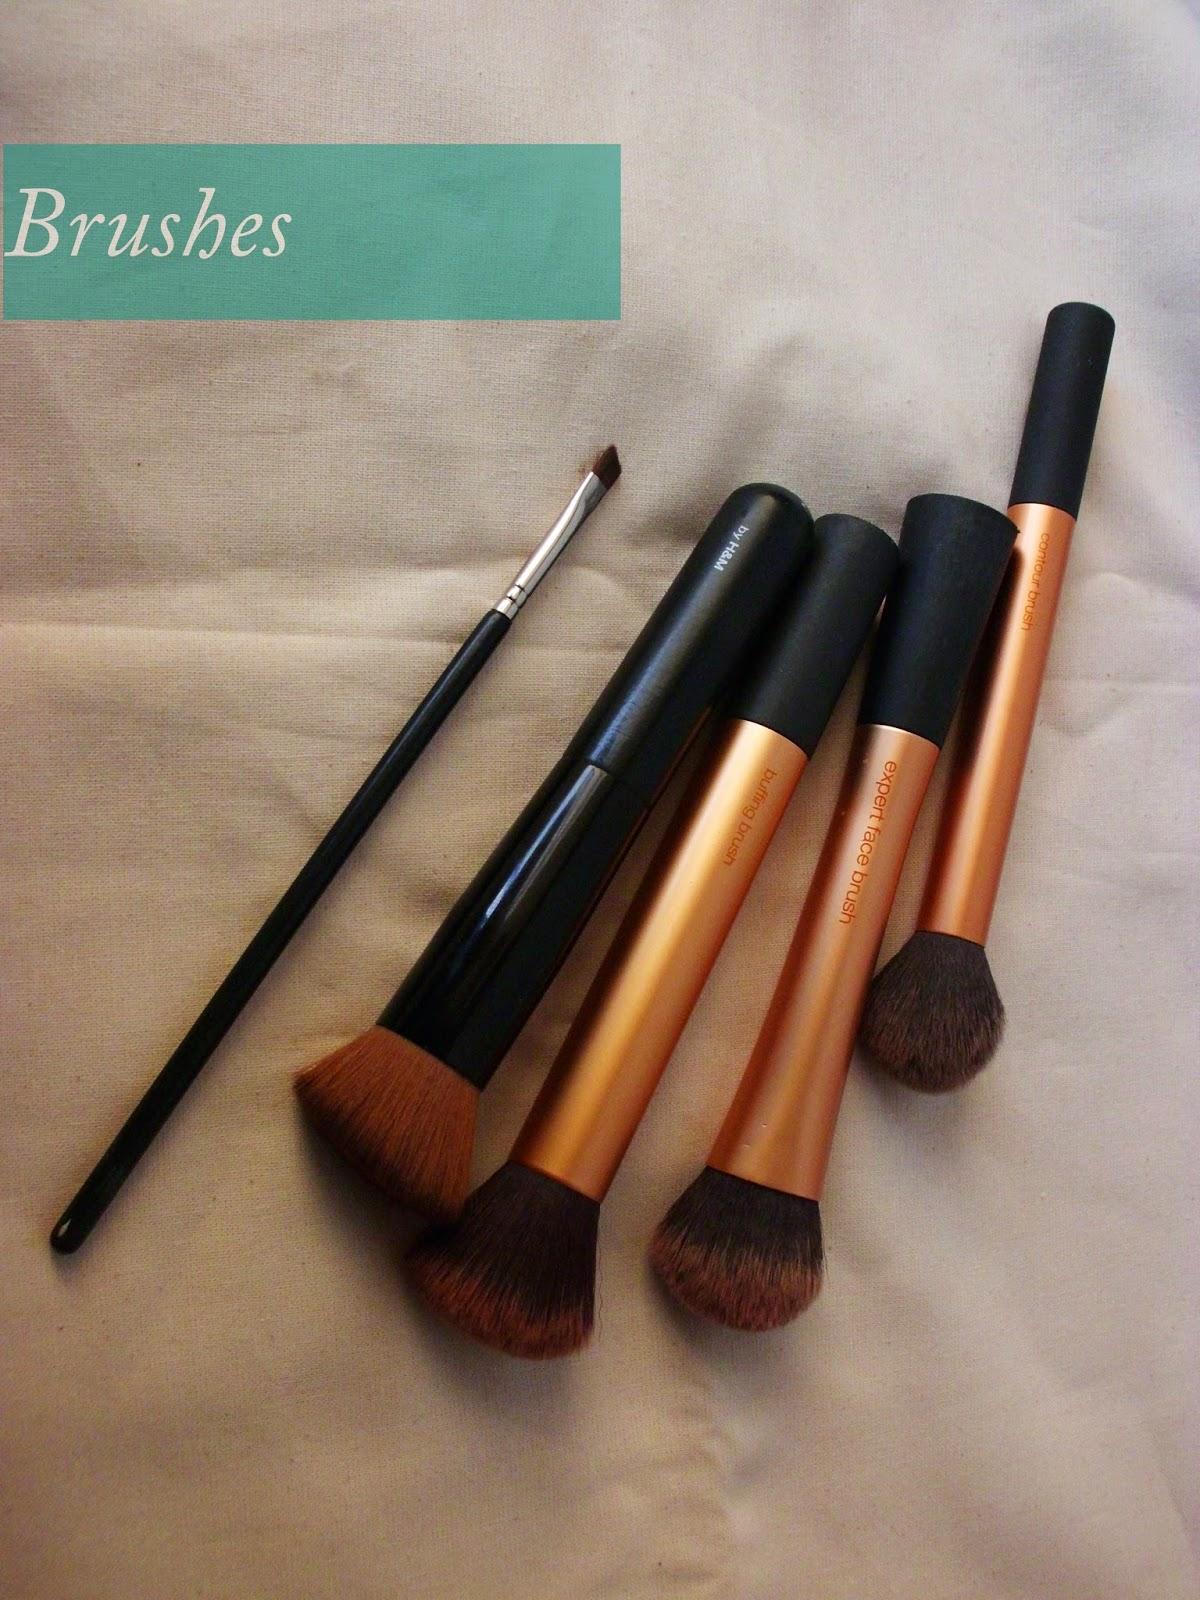 Brushes, Real Techniques, H&M, HAkuro